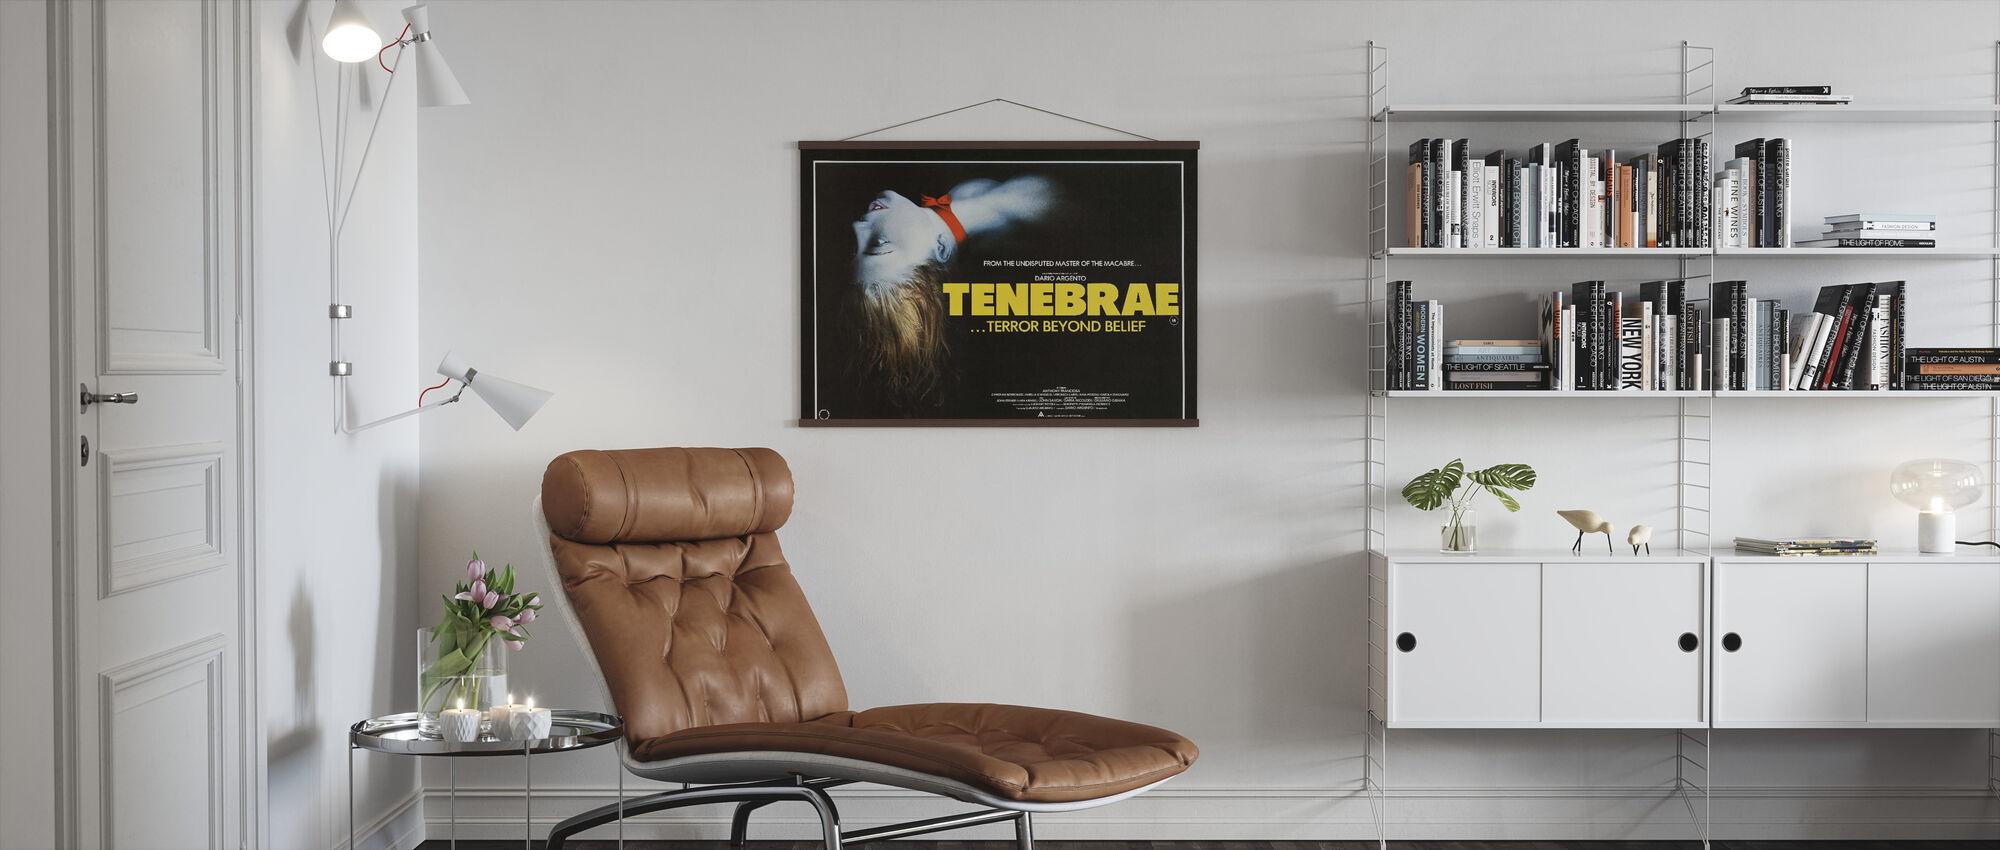 Tenebrae - Poster - Living Room